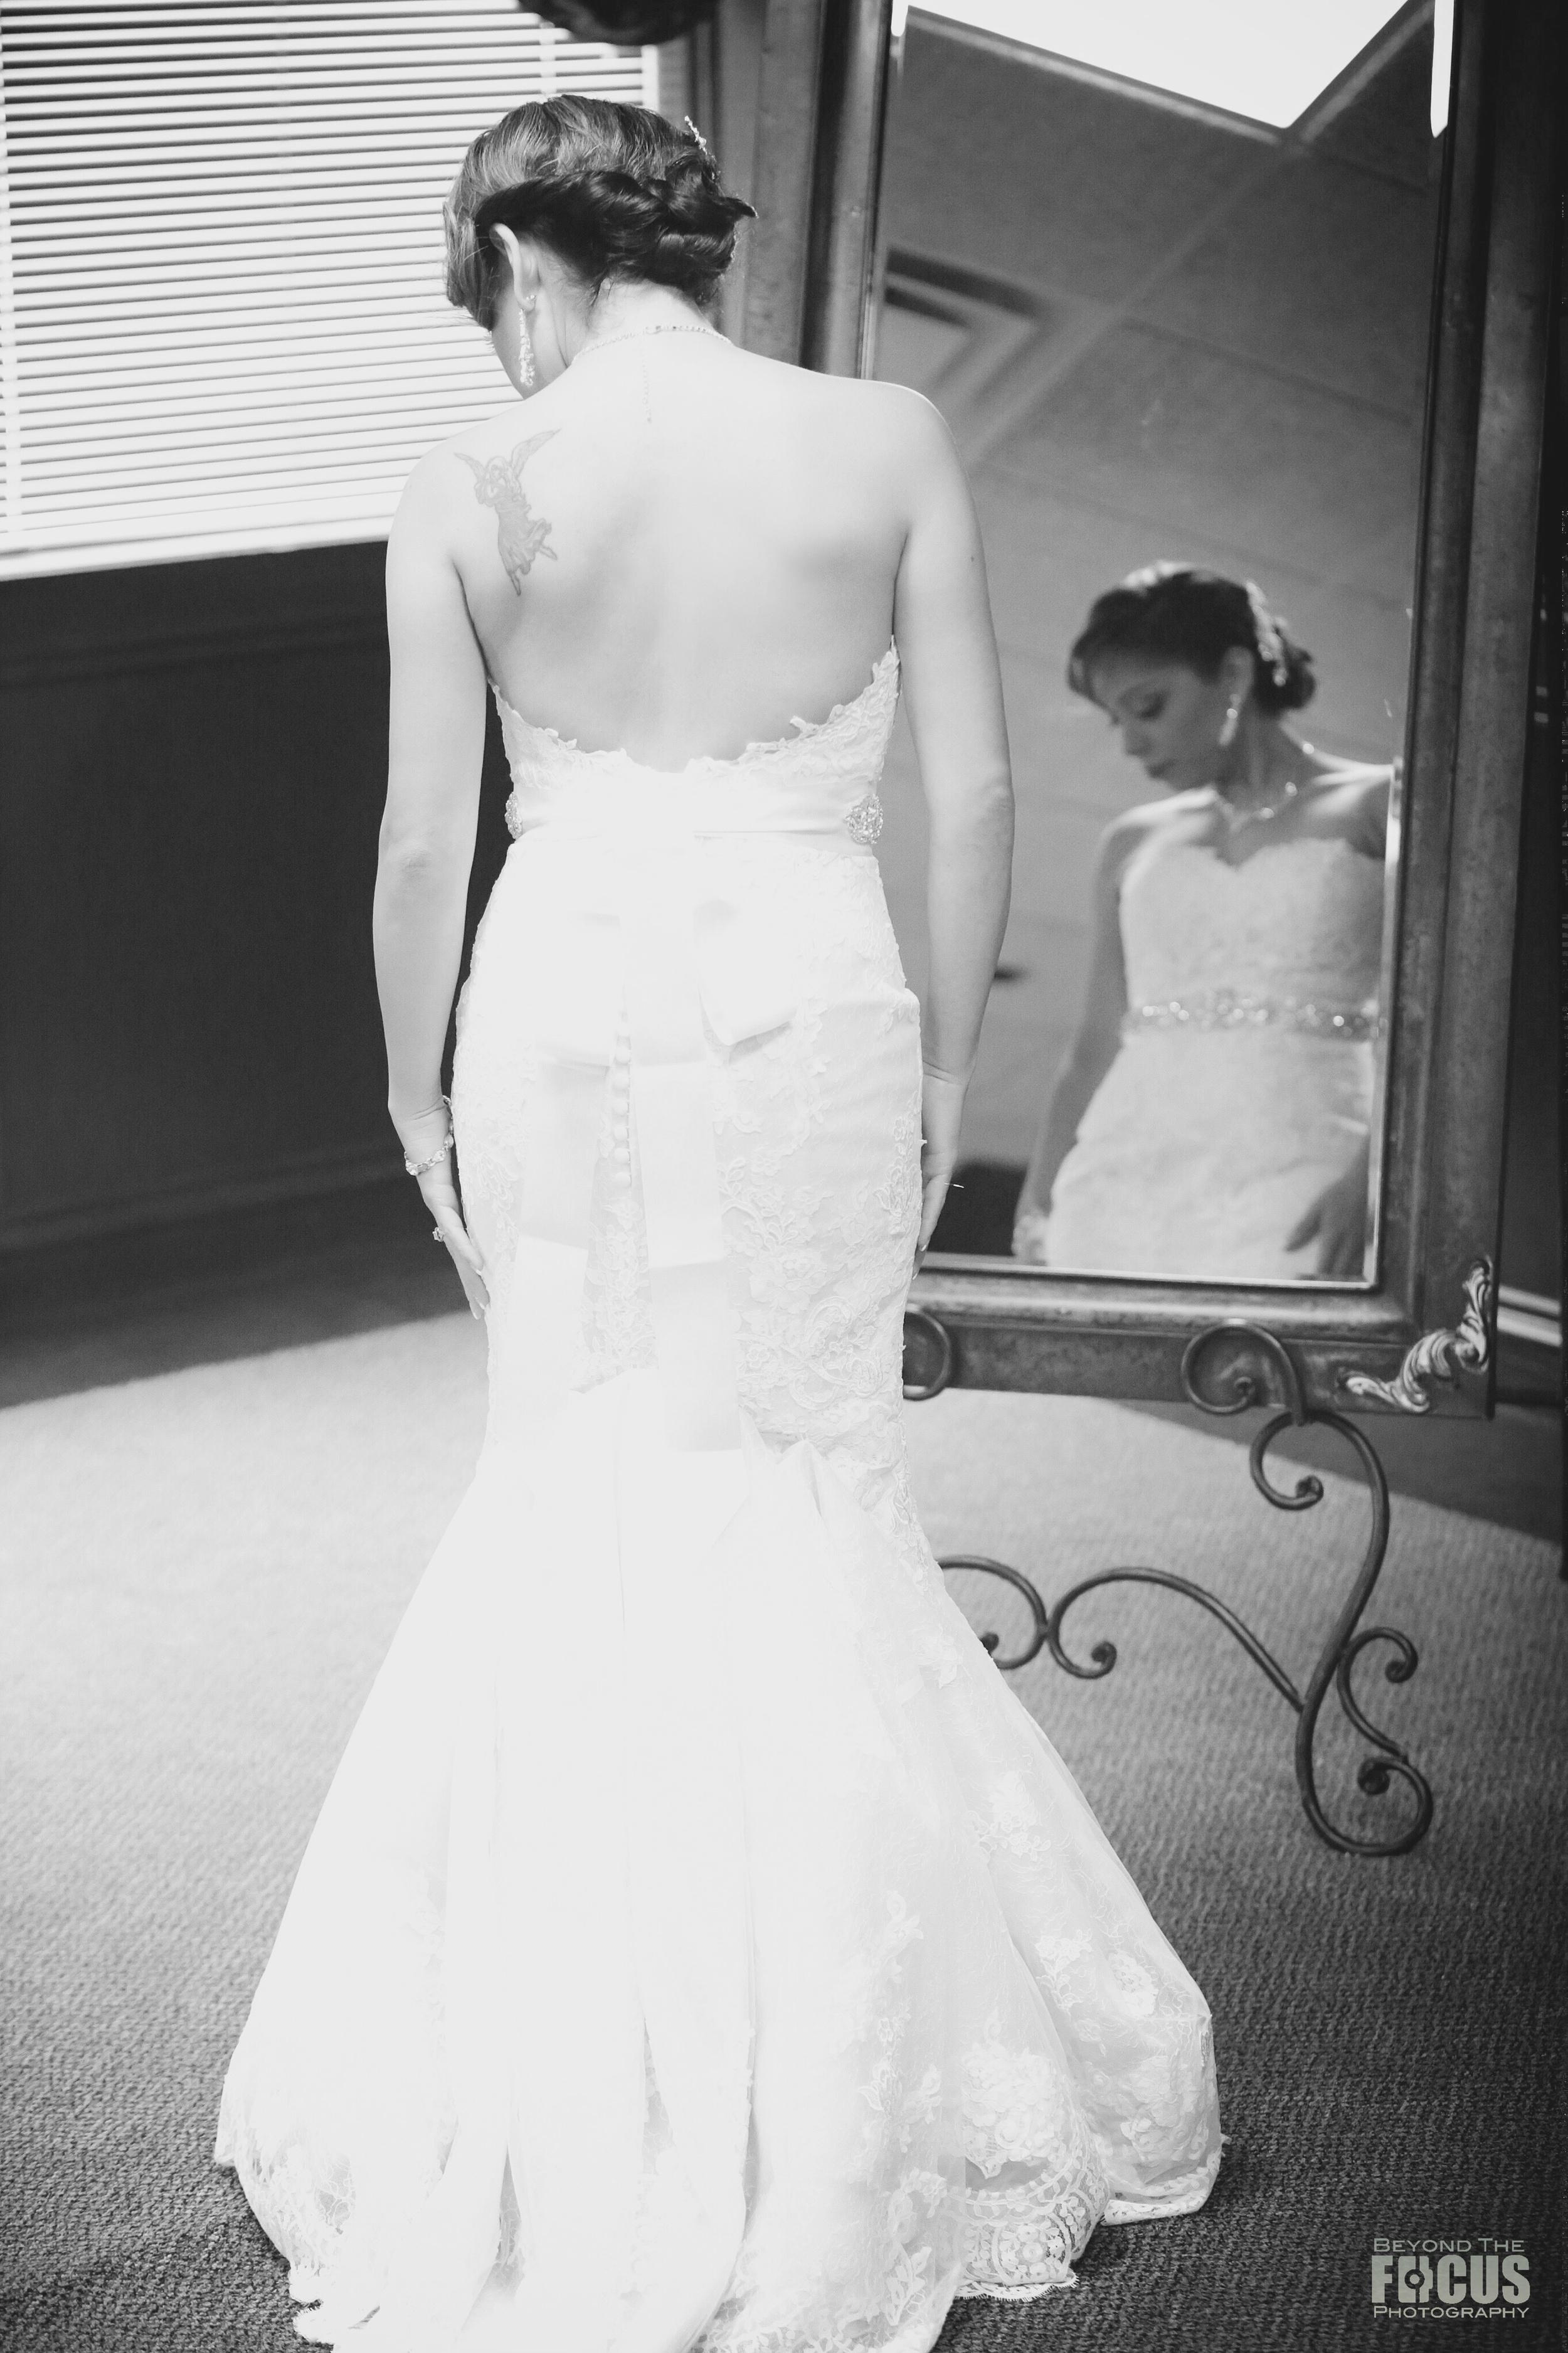 Palmer Wedding - Pre-Wedding Photos 1.jpg